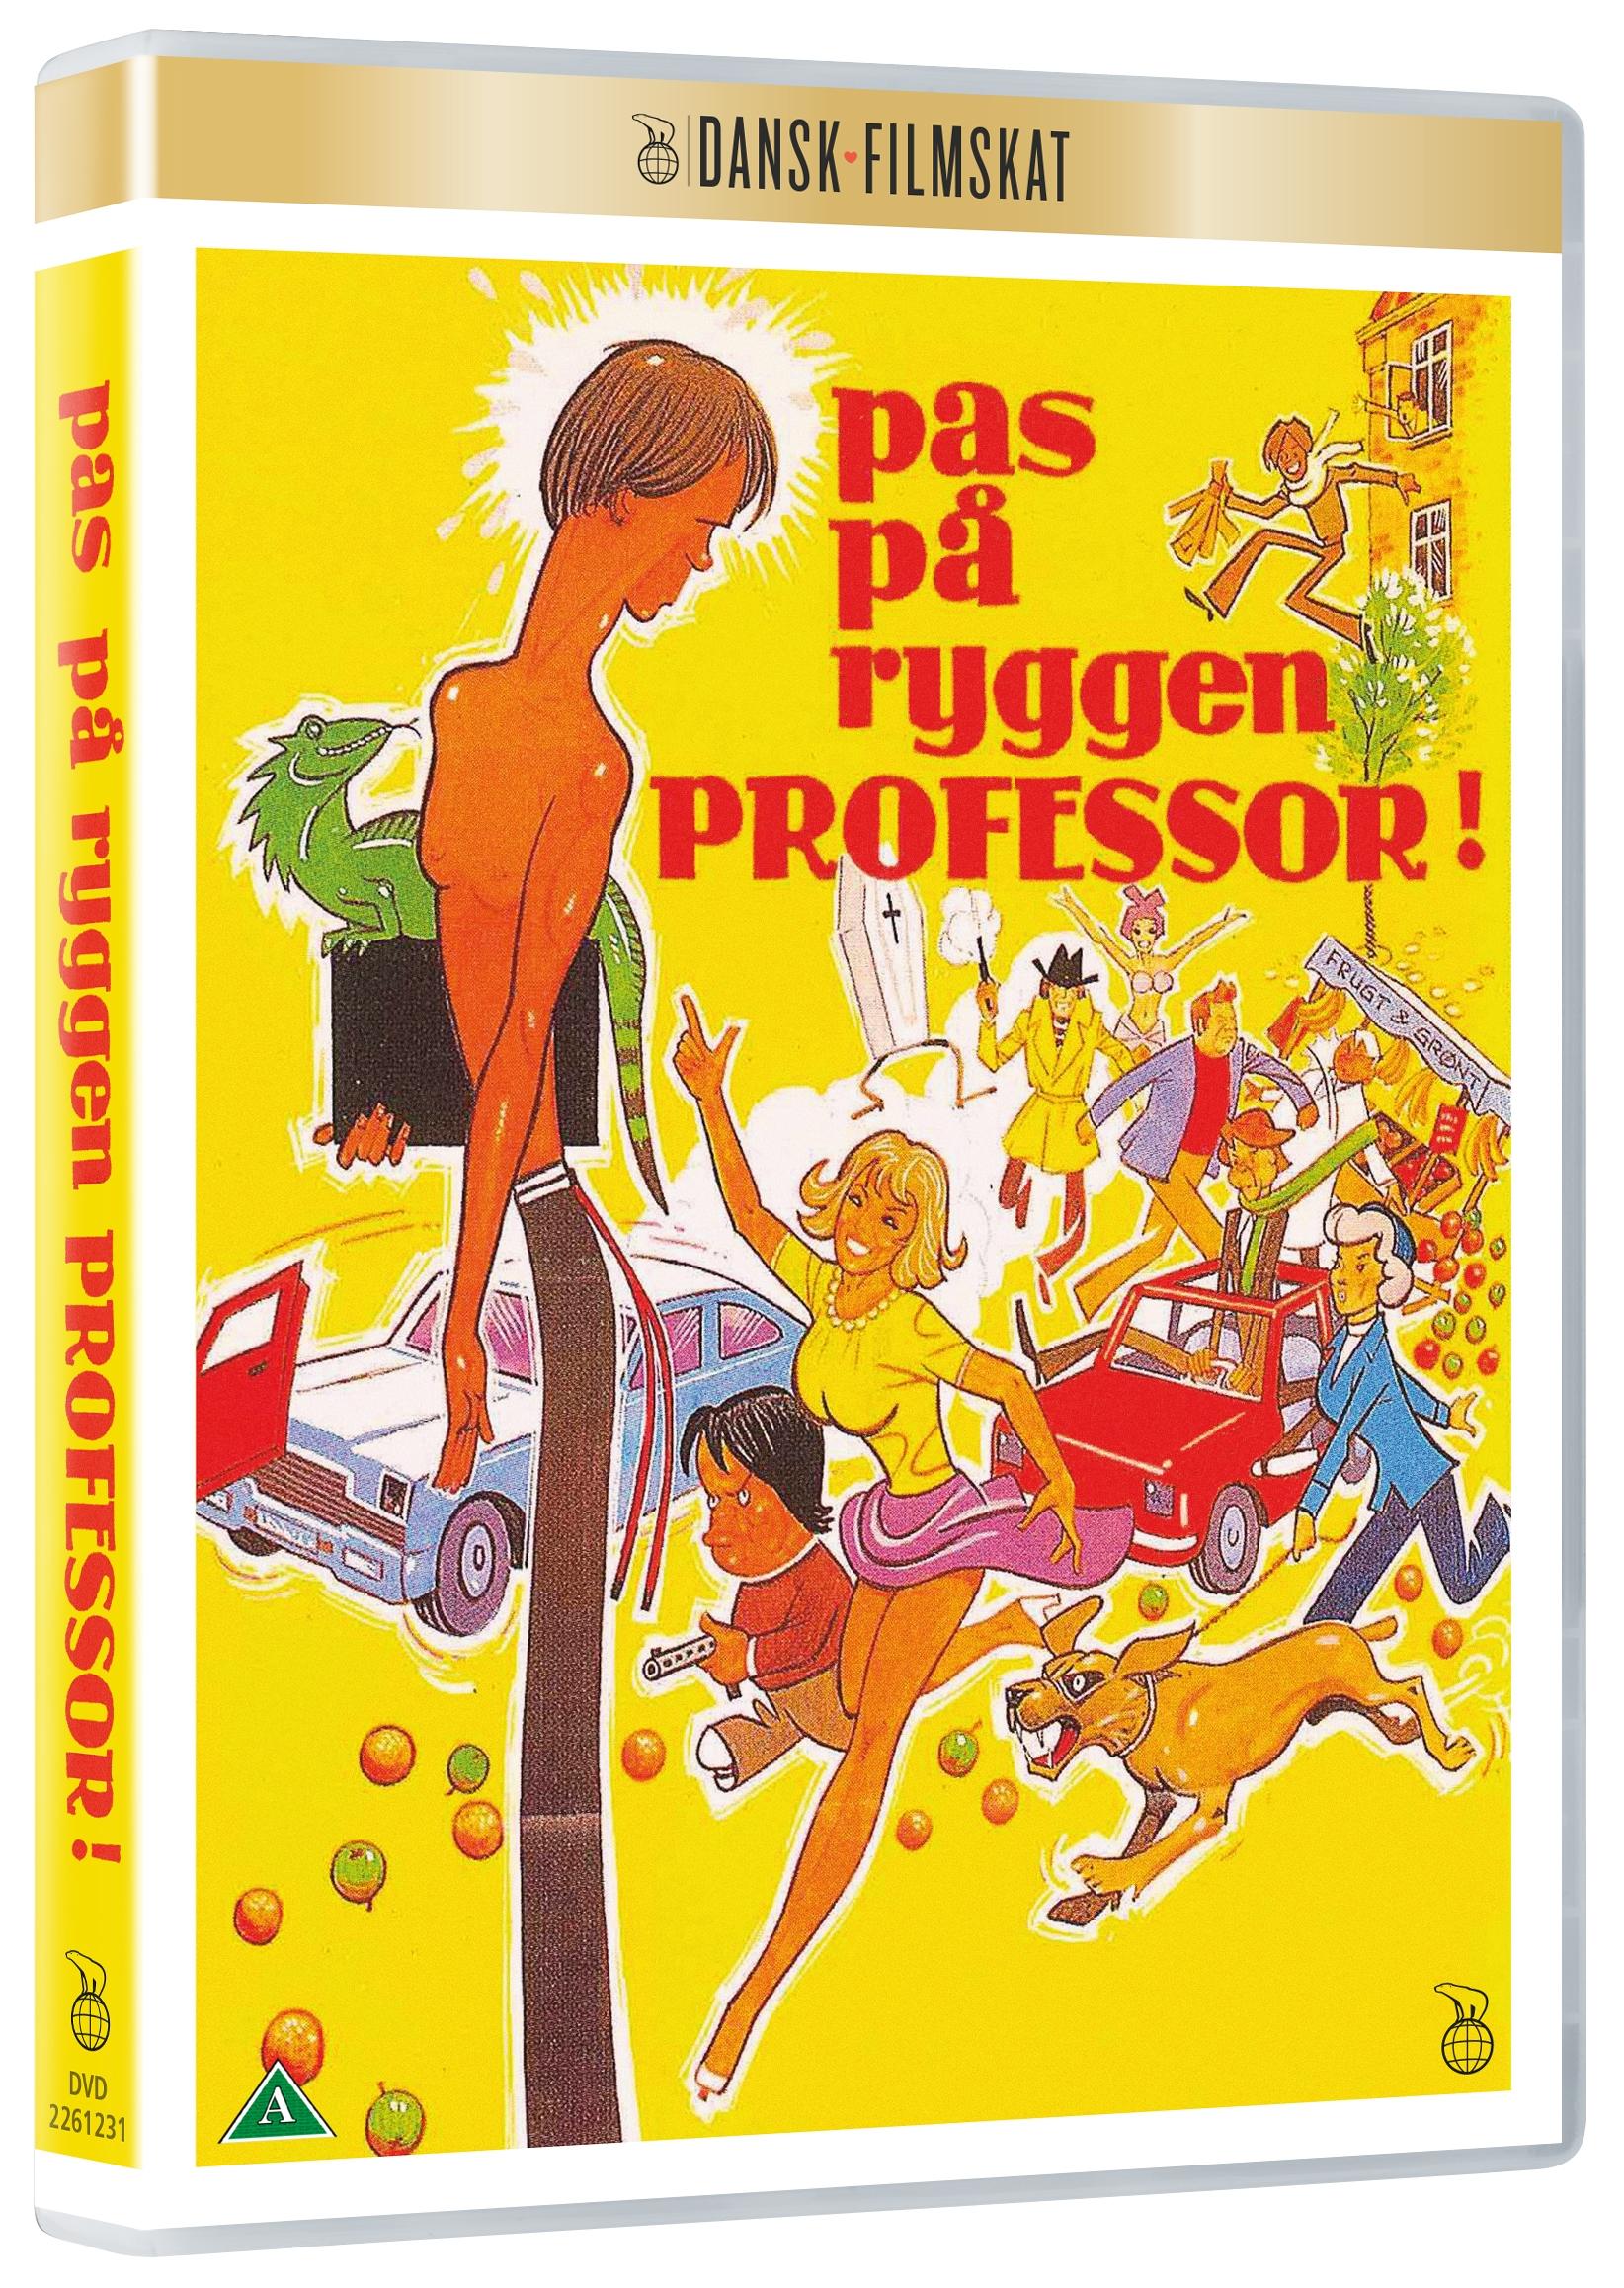 Pas På Ryggen, Professor -  - Film - Nordisk Film - 5708758704618 - May 15, 2020